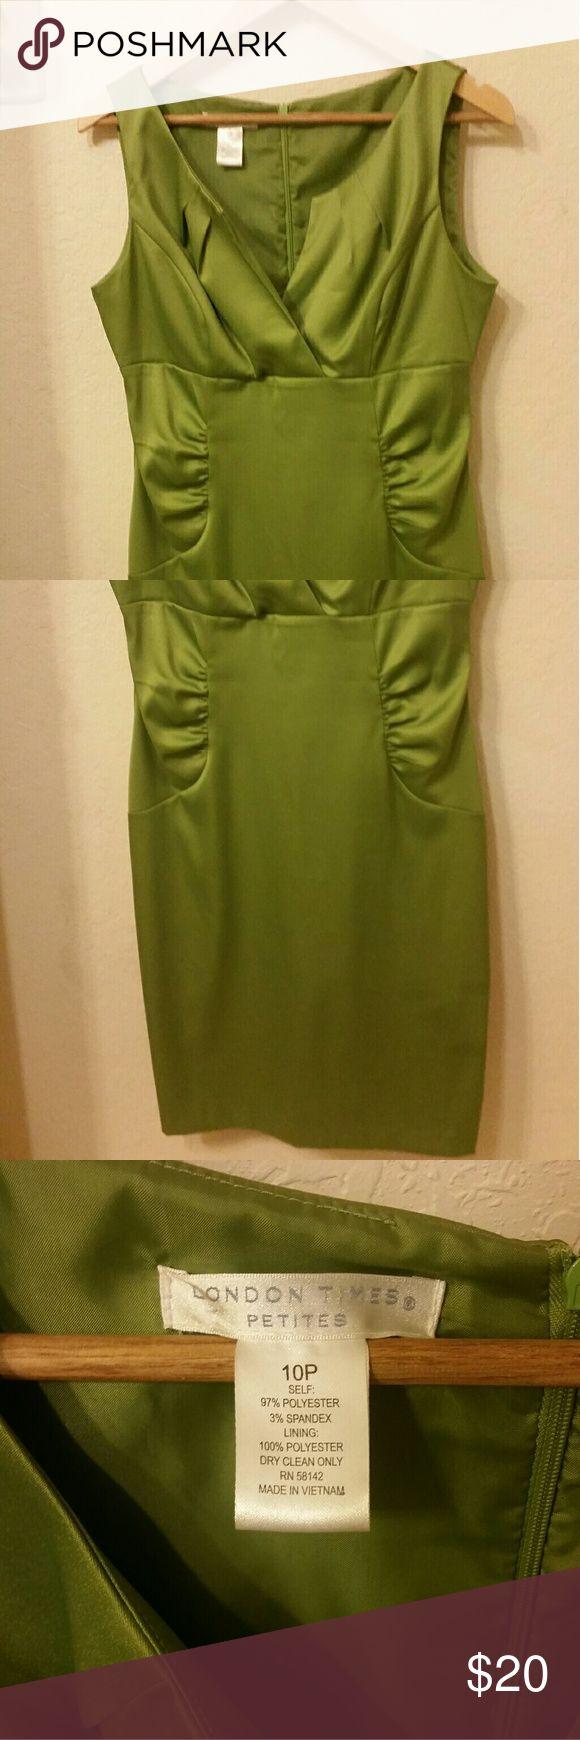 Petite Dress Cute Green Party Dress size 10P London Times Dresses